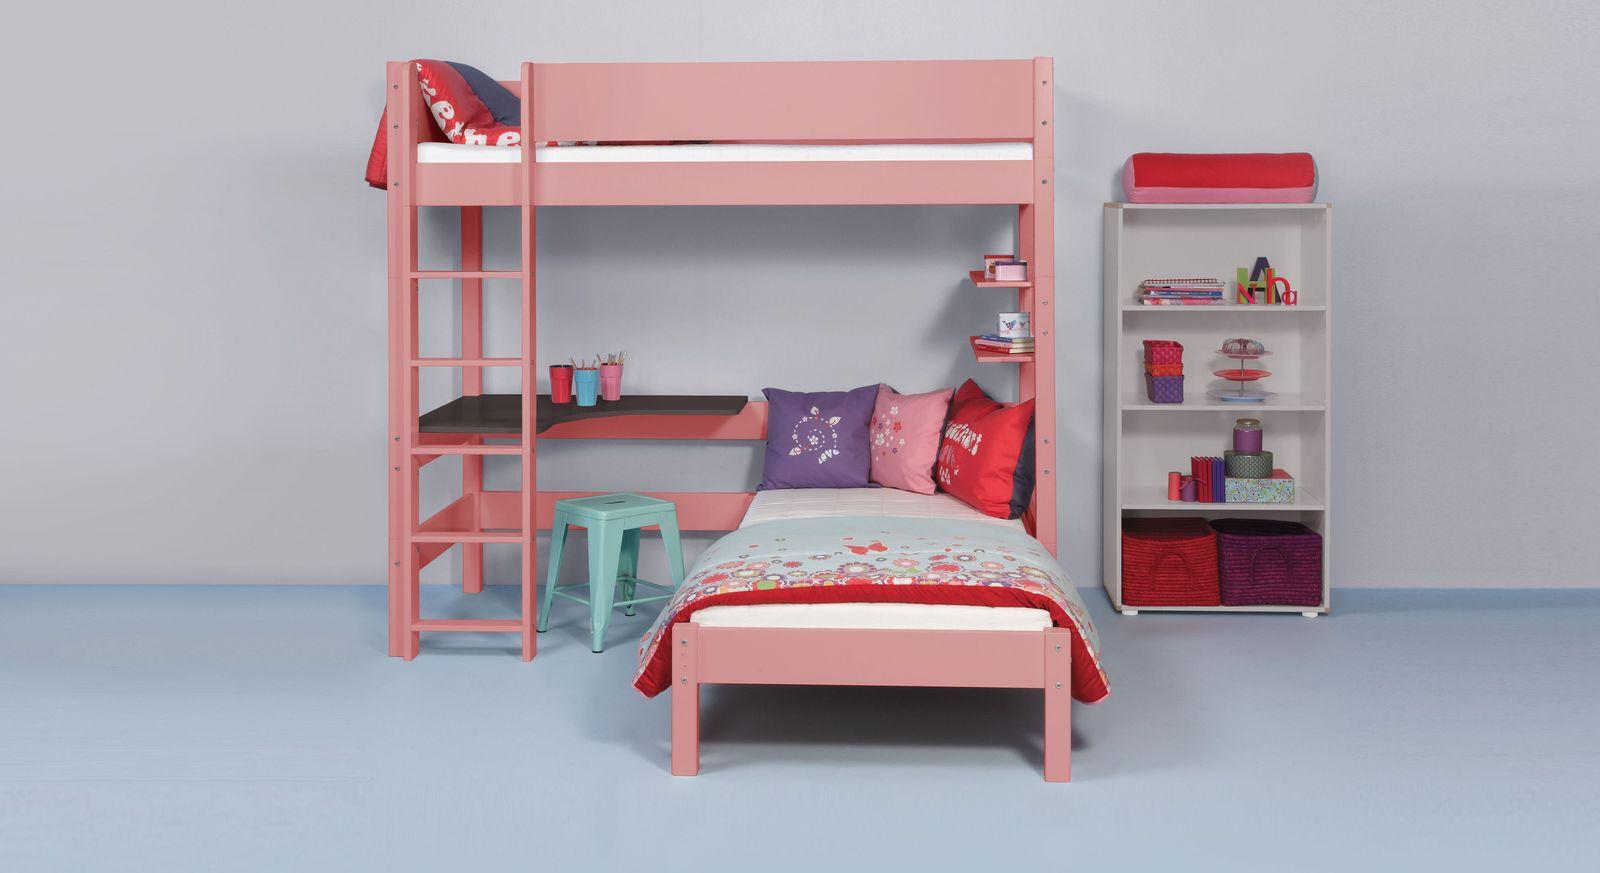 Modernes Eck-Etagenbett Kids Town Color aus stabilem MDF